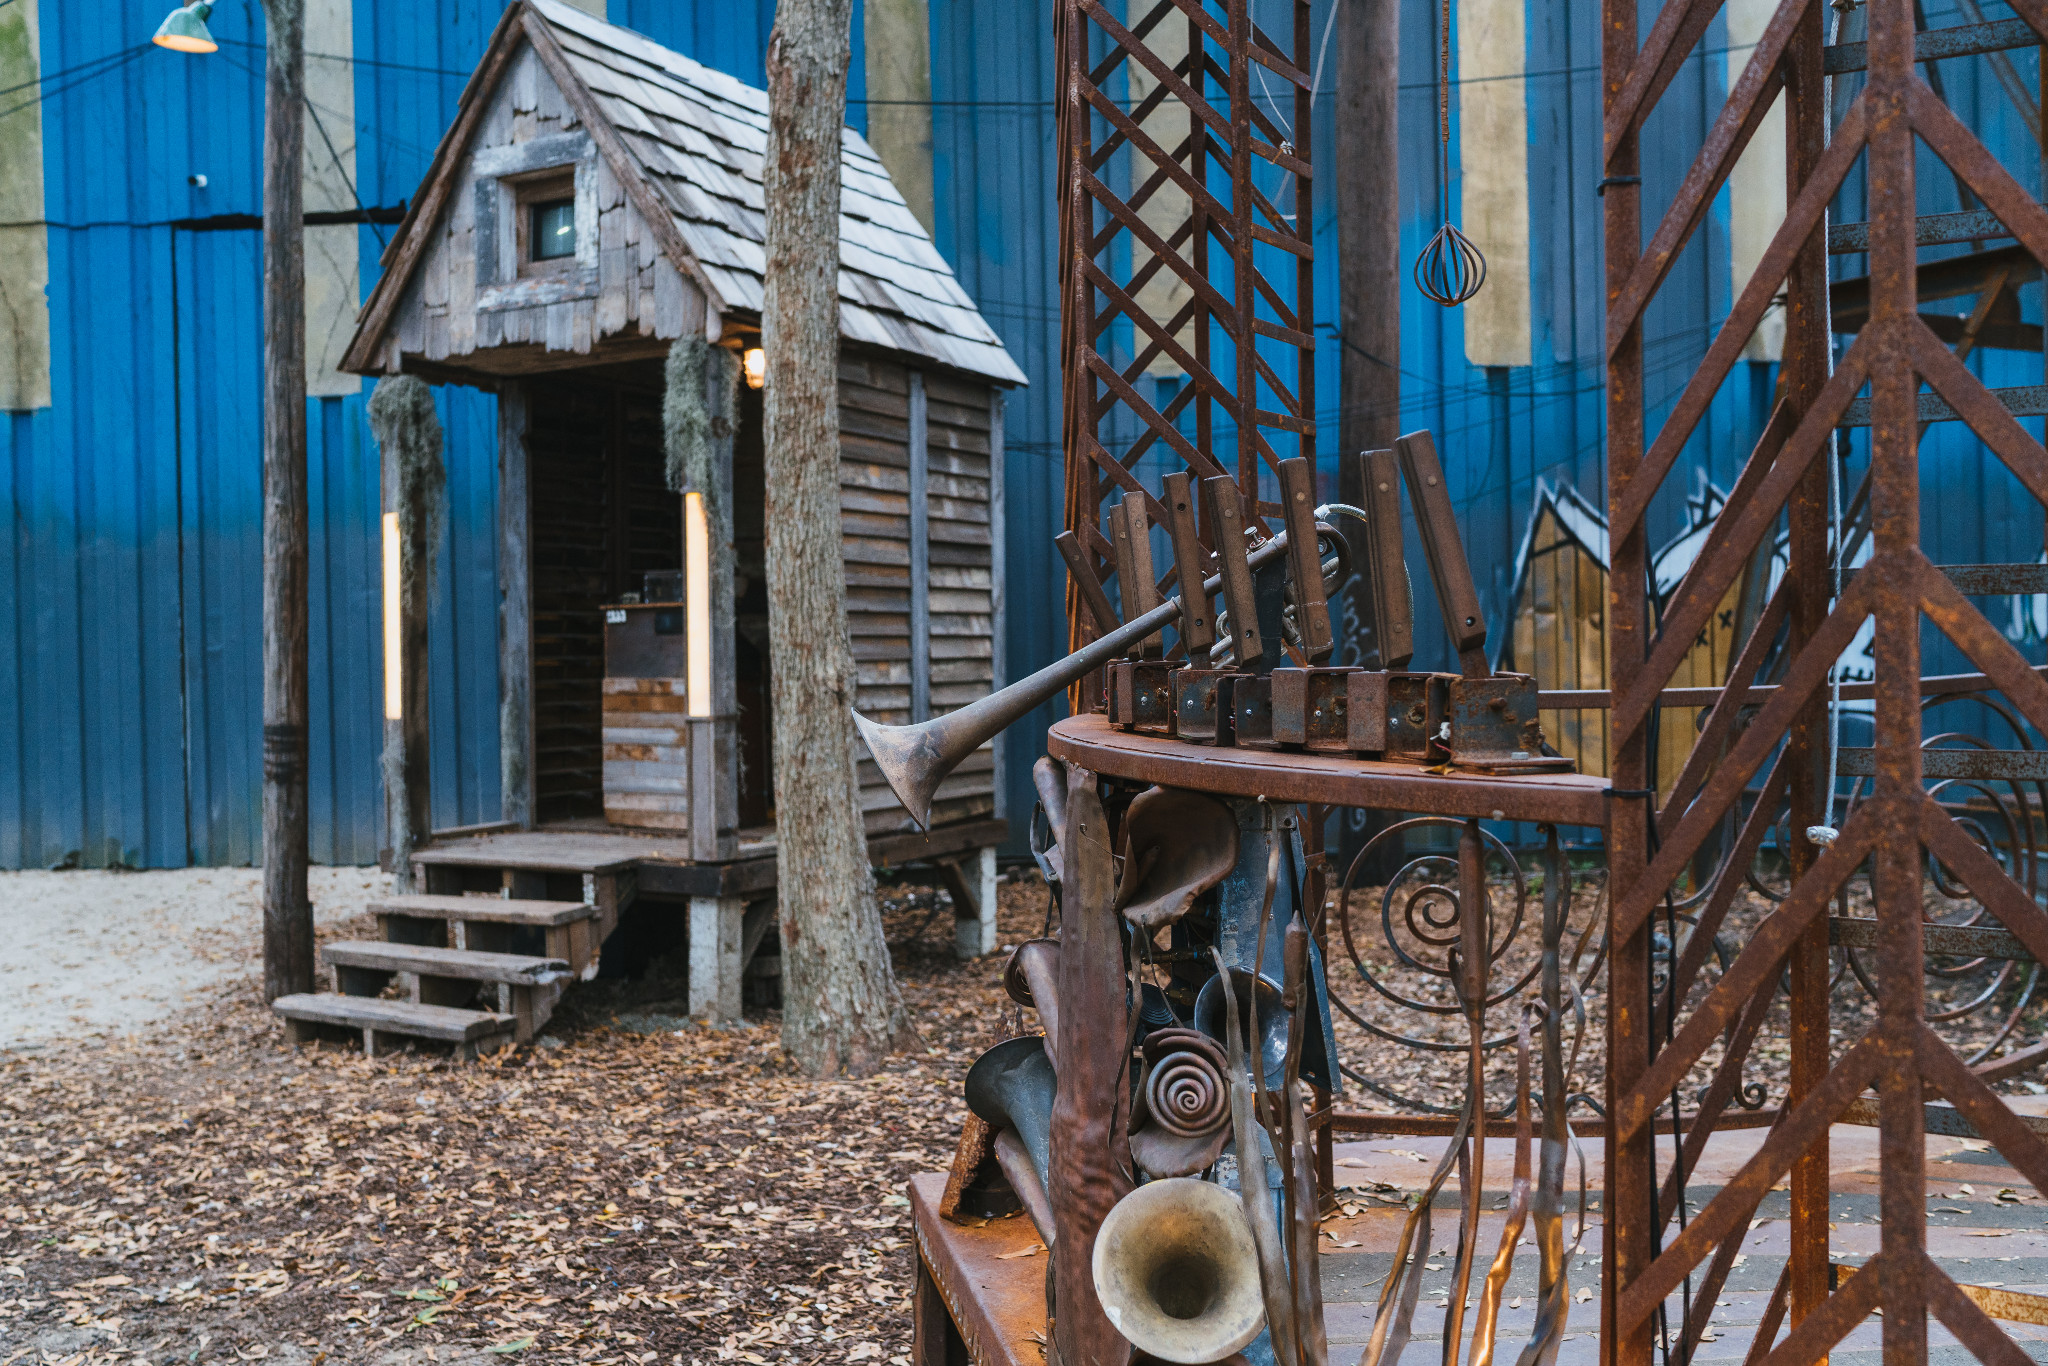 The Music Box Village (Photo: Paul Broussard)